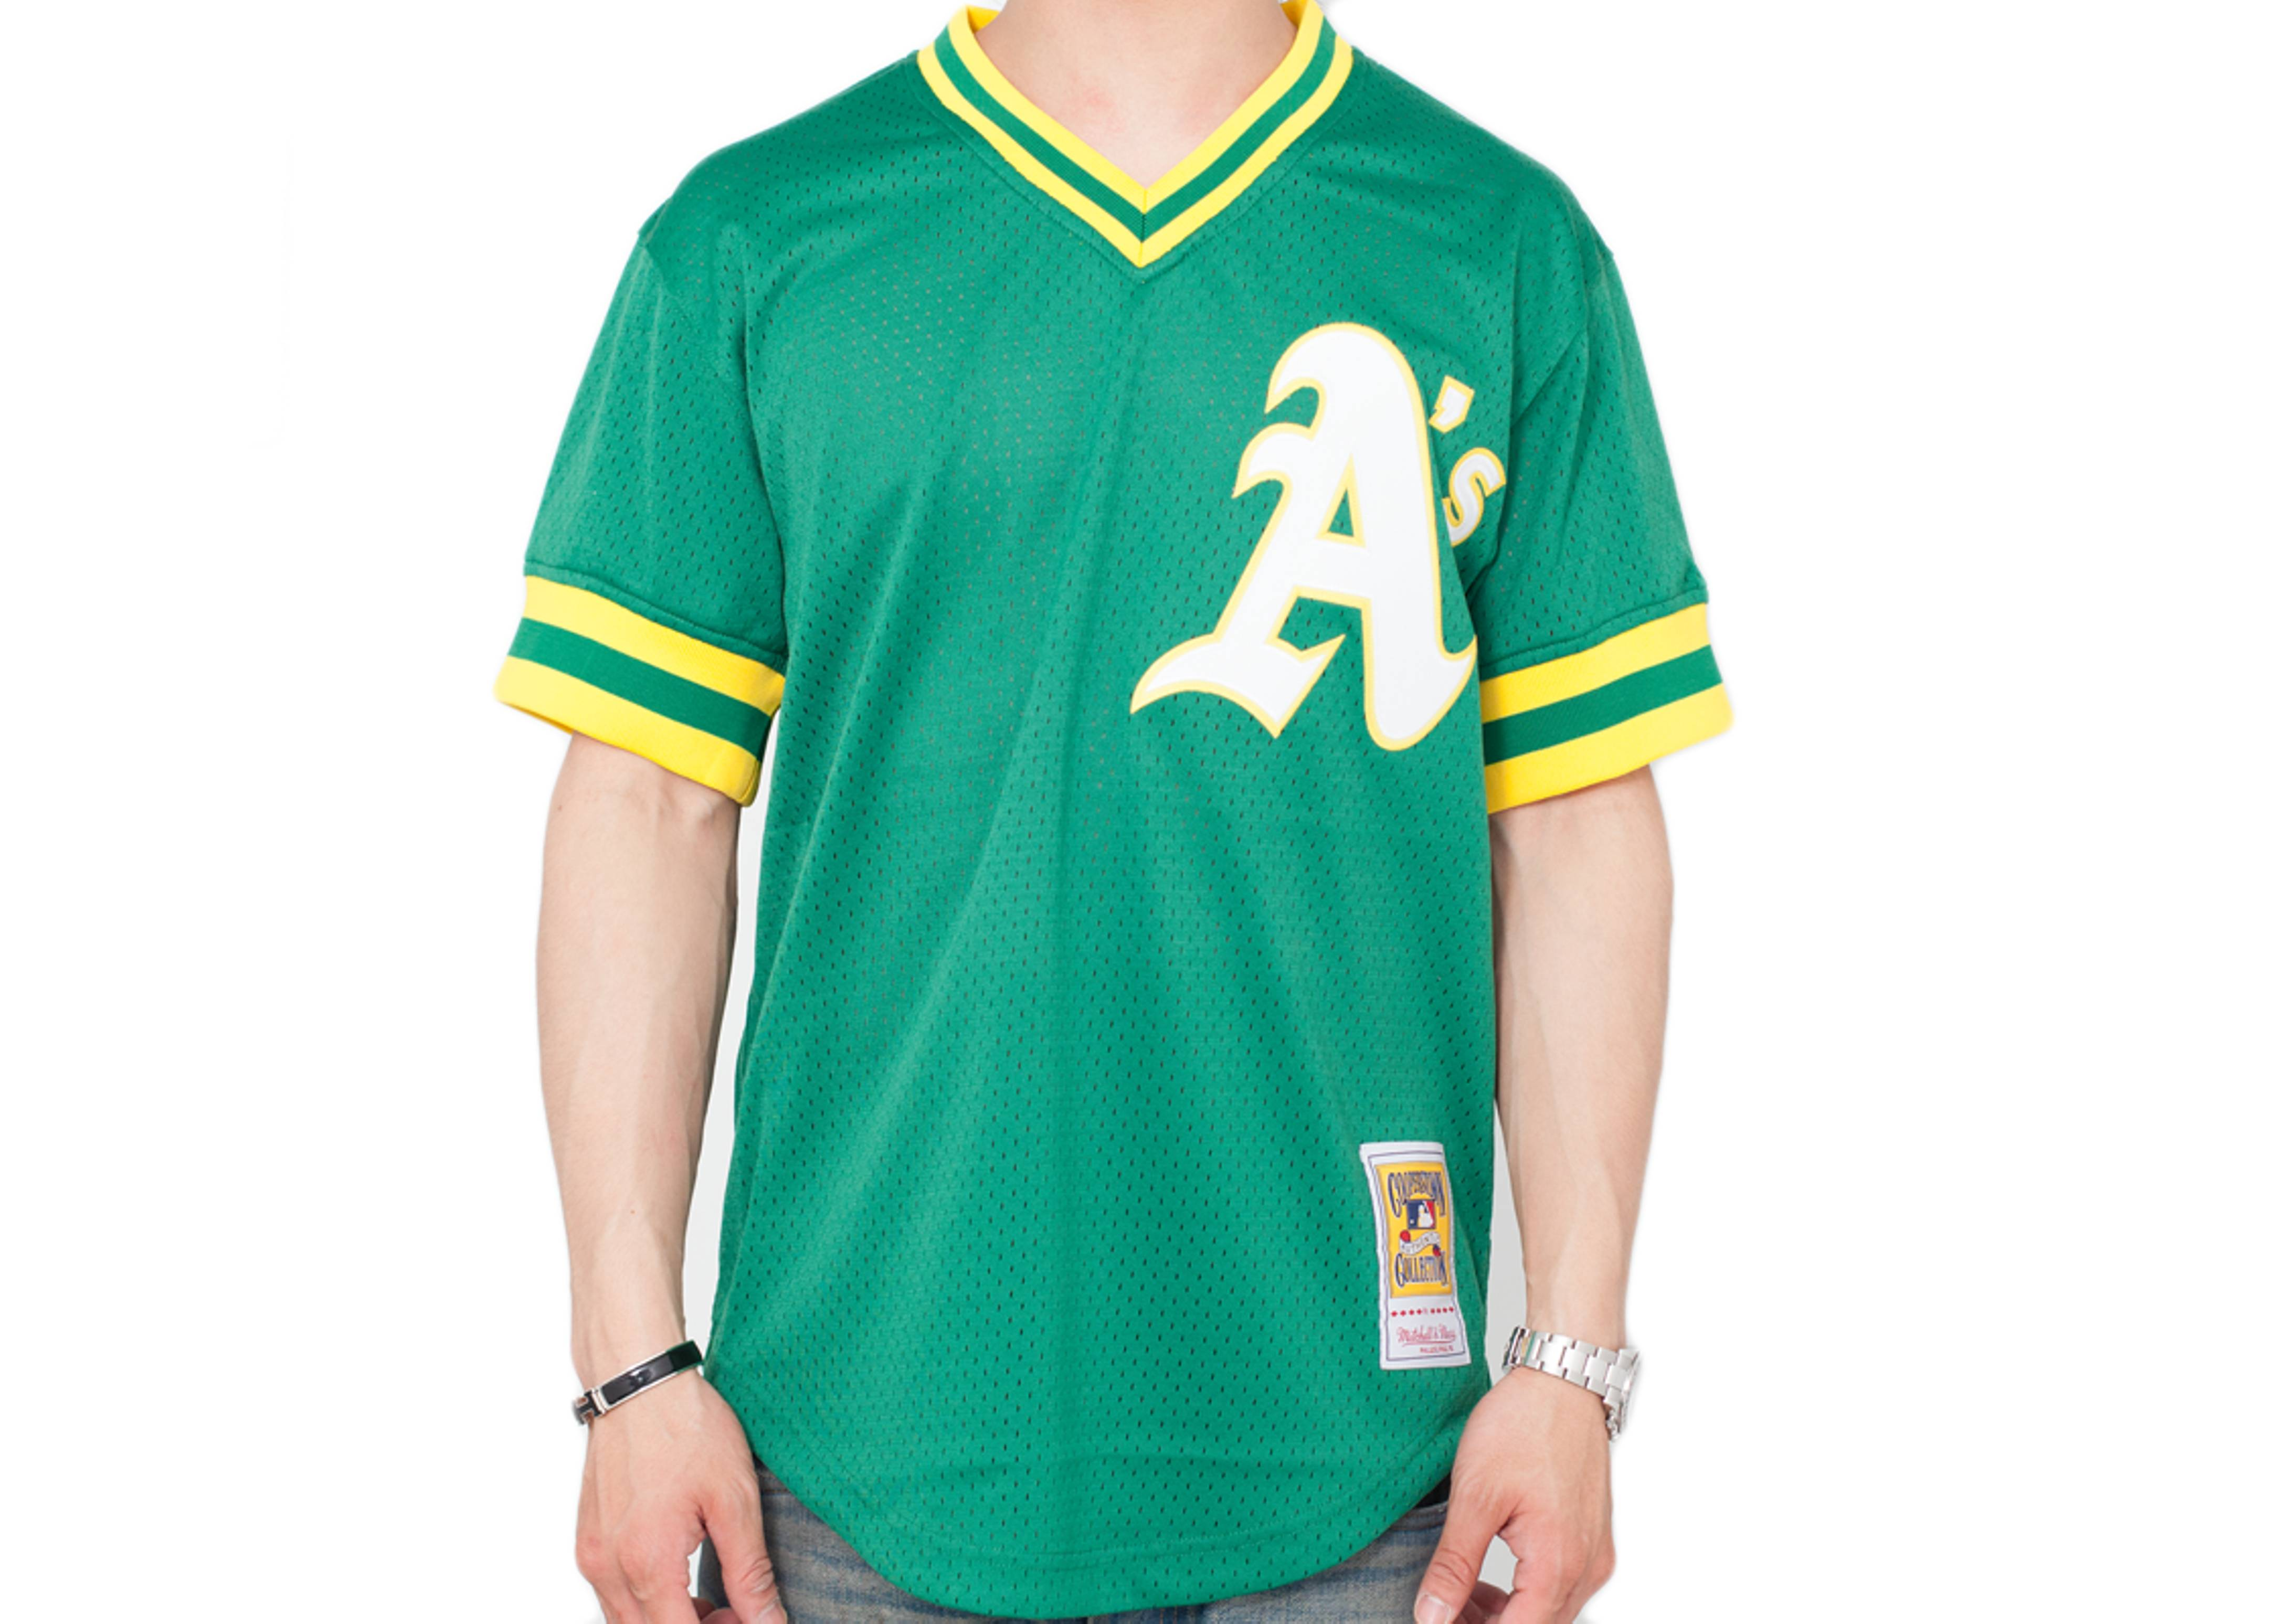 75975389392 oakland athletics authentic mesh bp jersey